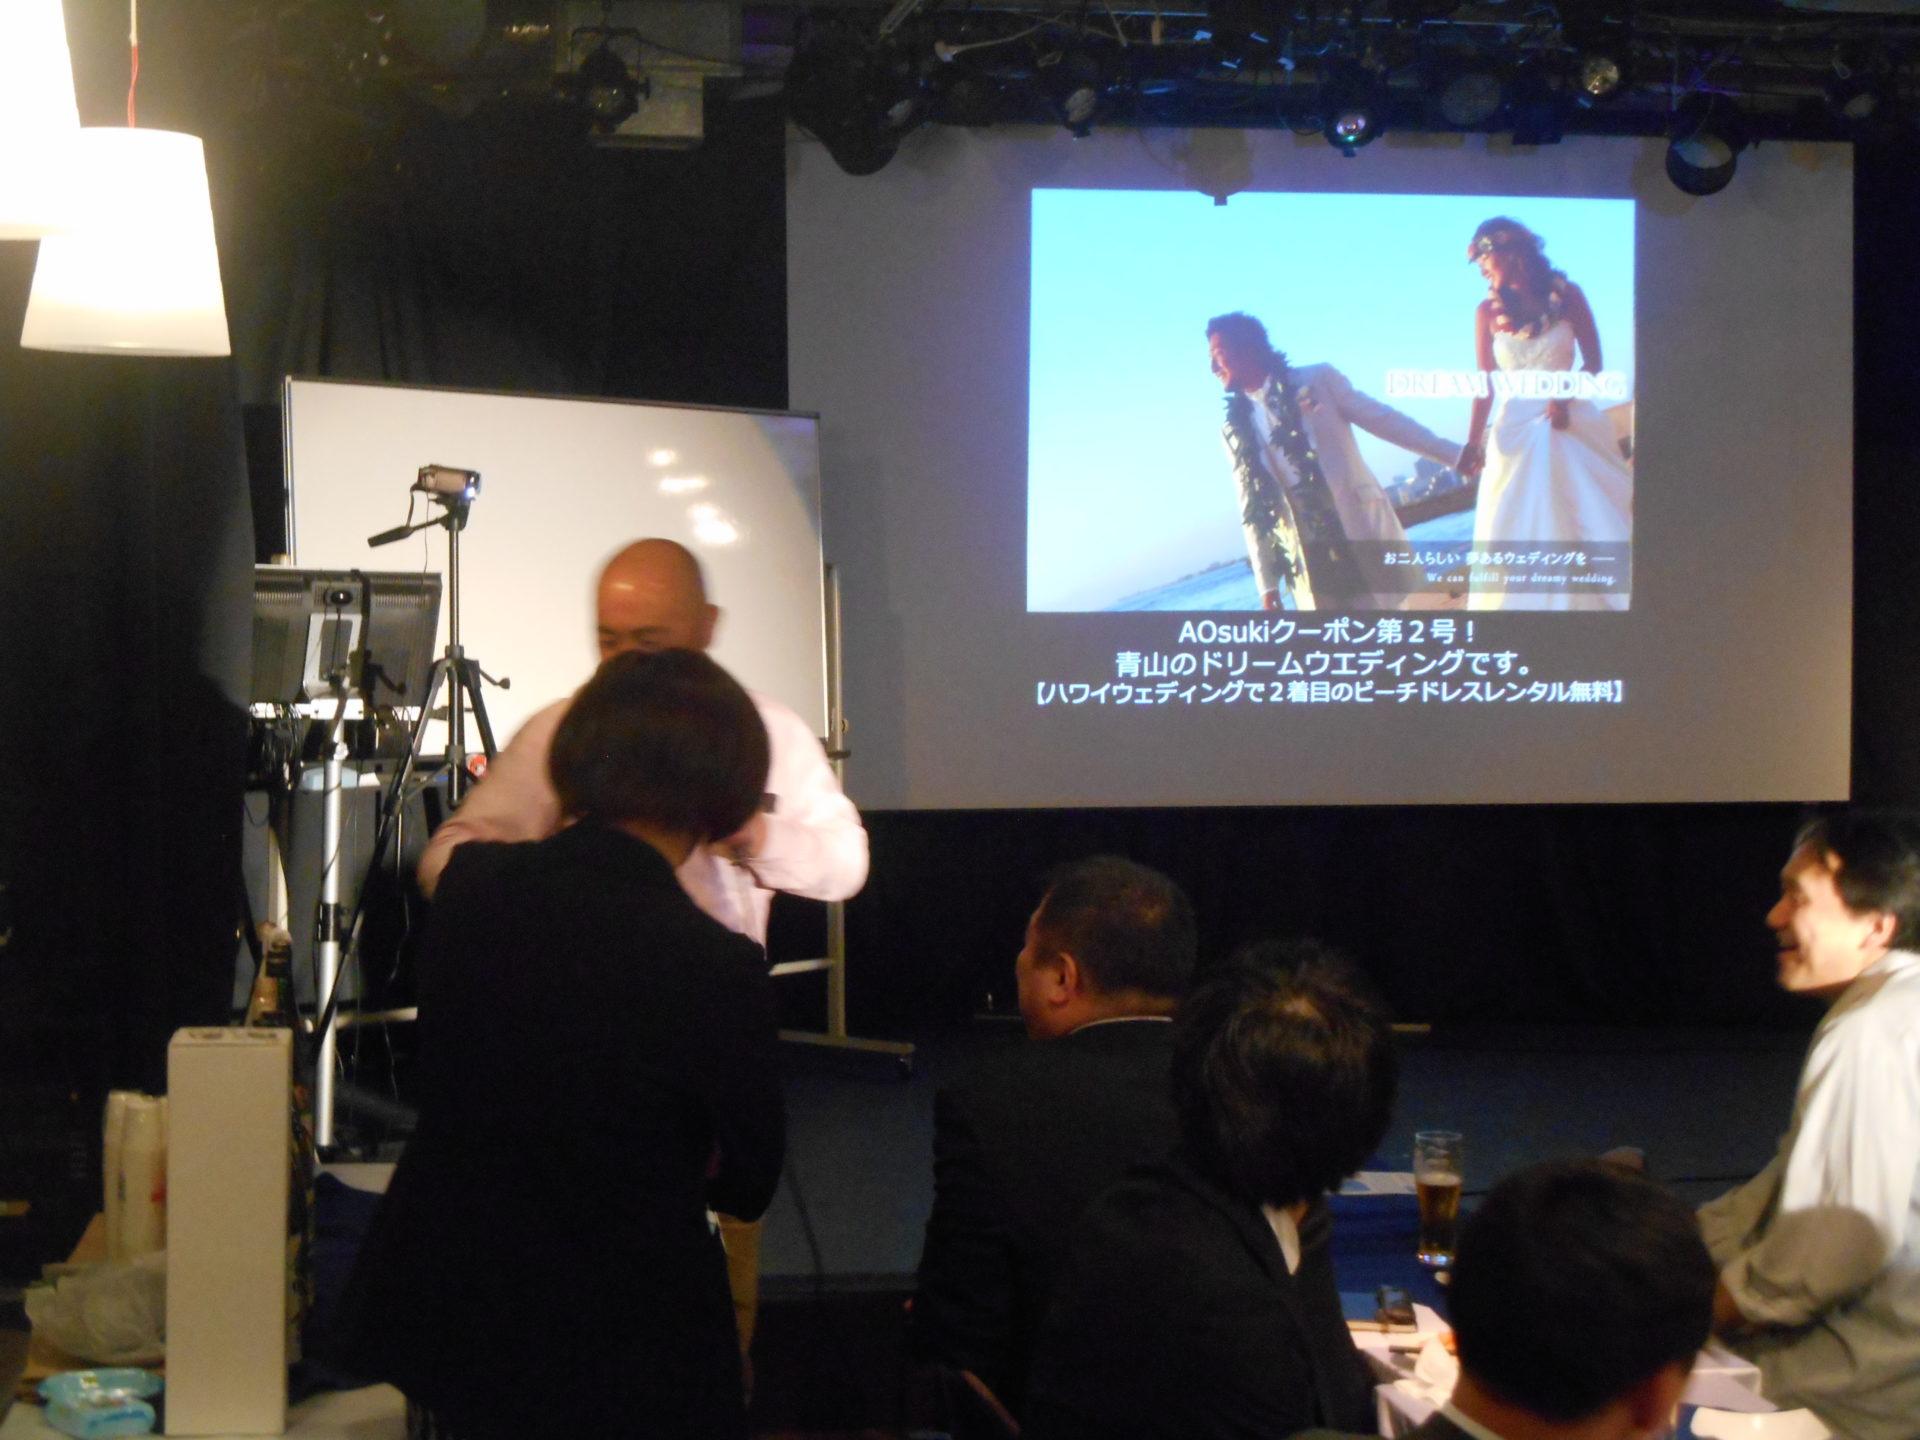 DSCN1064 1920x1440 - 2016年3月11日(金)AOsuki総会&パーティー開催しました。